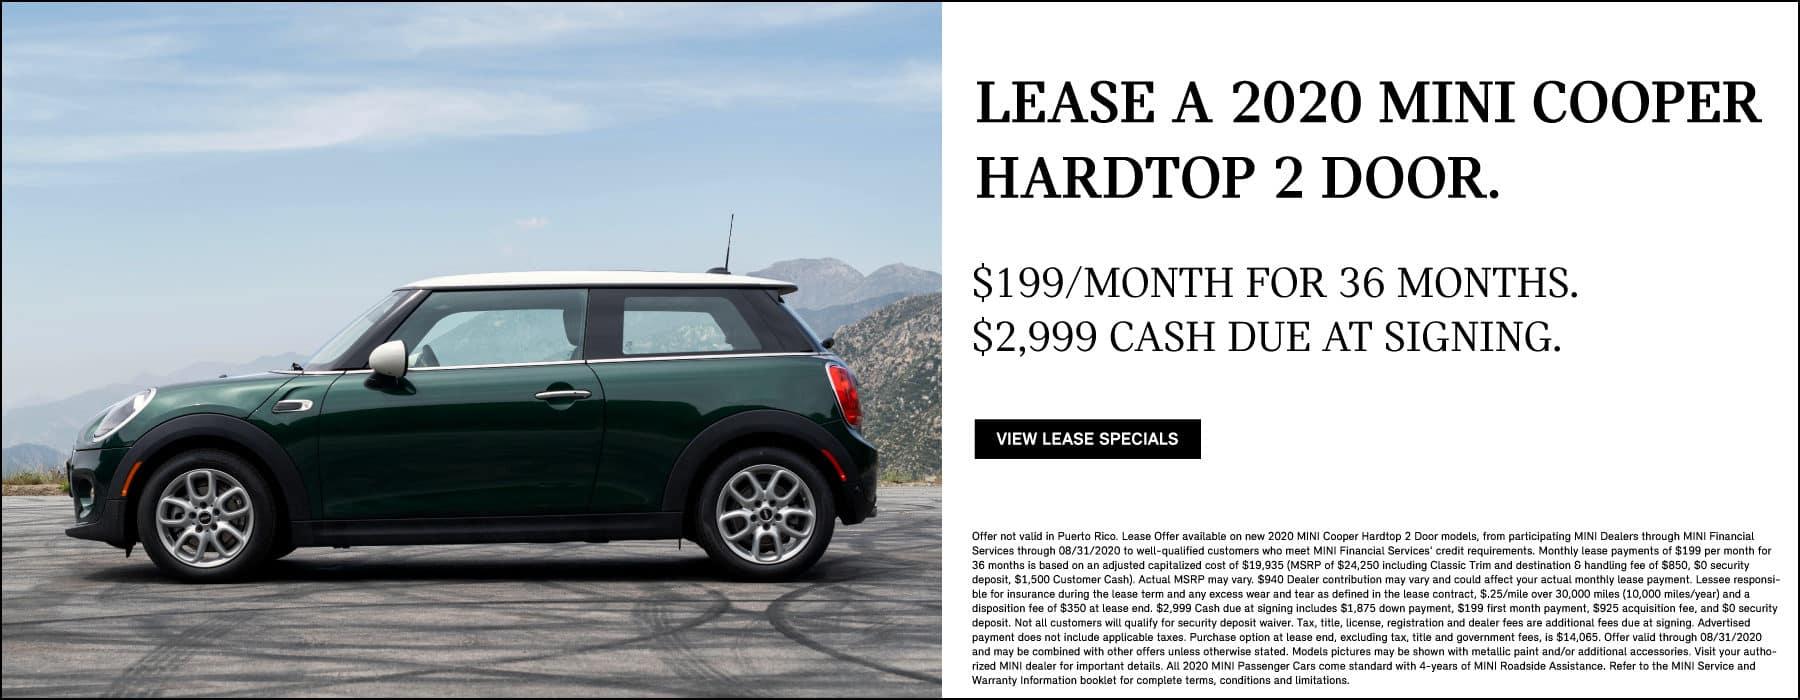 Lease a 2020 MINI Cooper Hardtop 2 Door for $199/mo